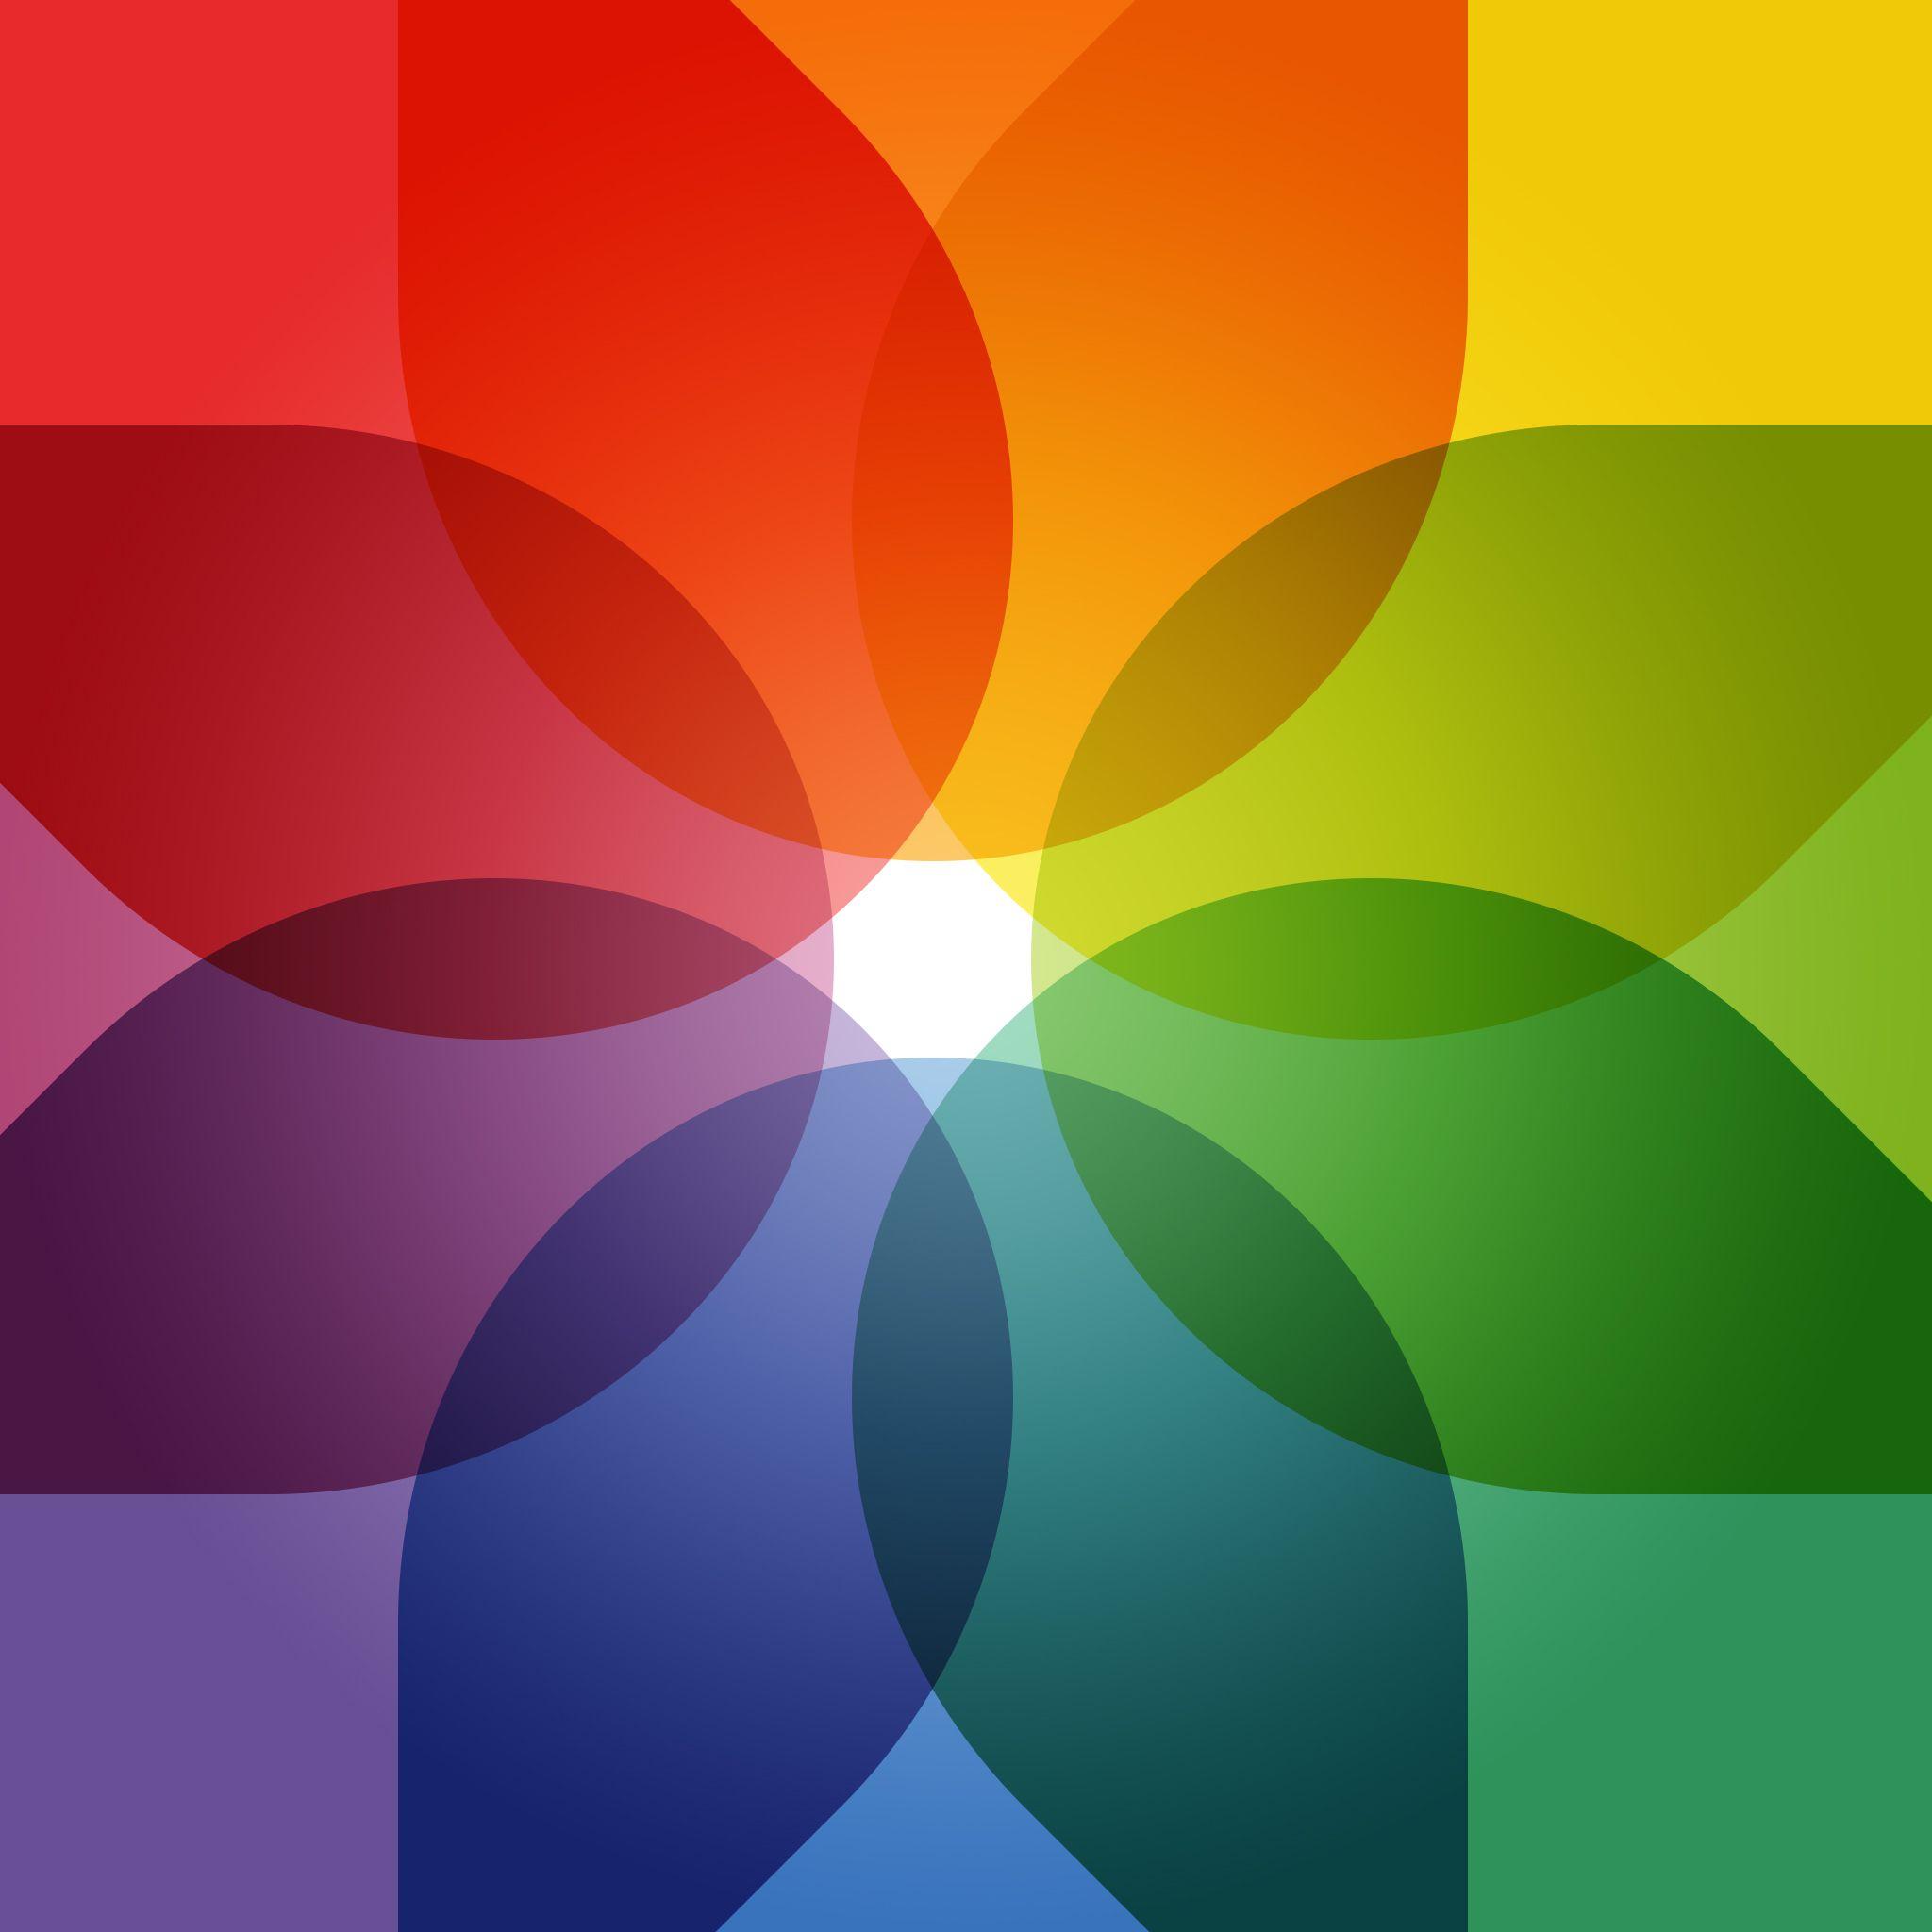 ios 7 photo app icon ipad wallpaper hd ipad wallpaper